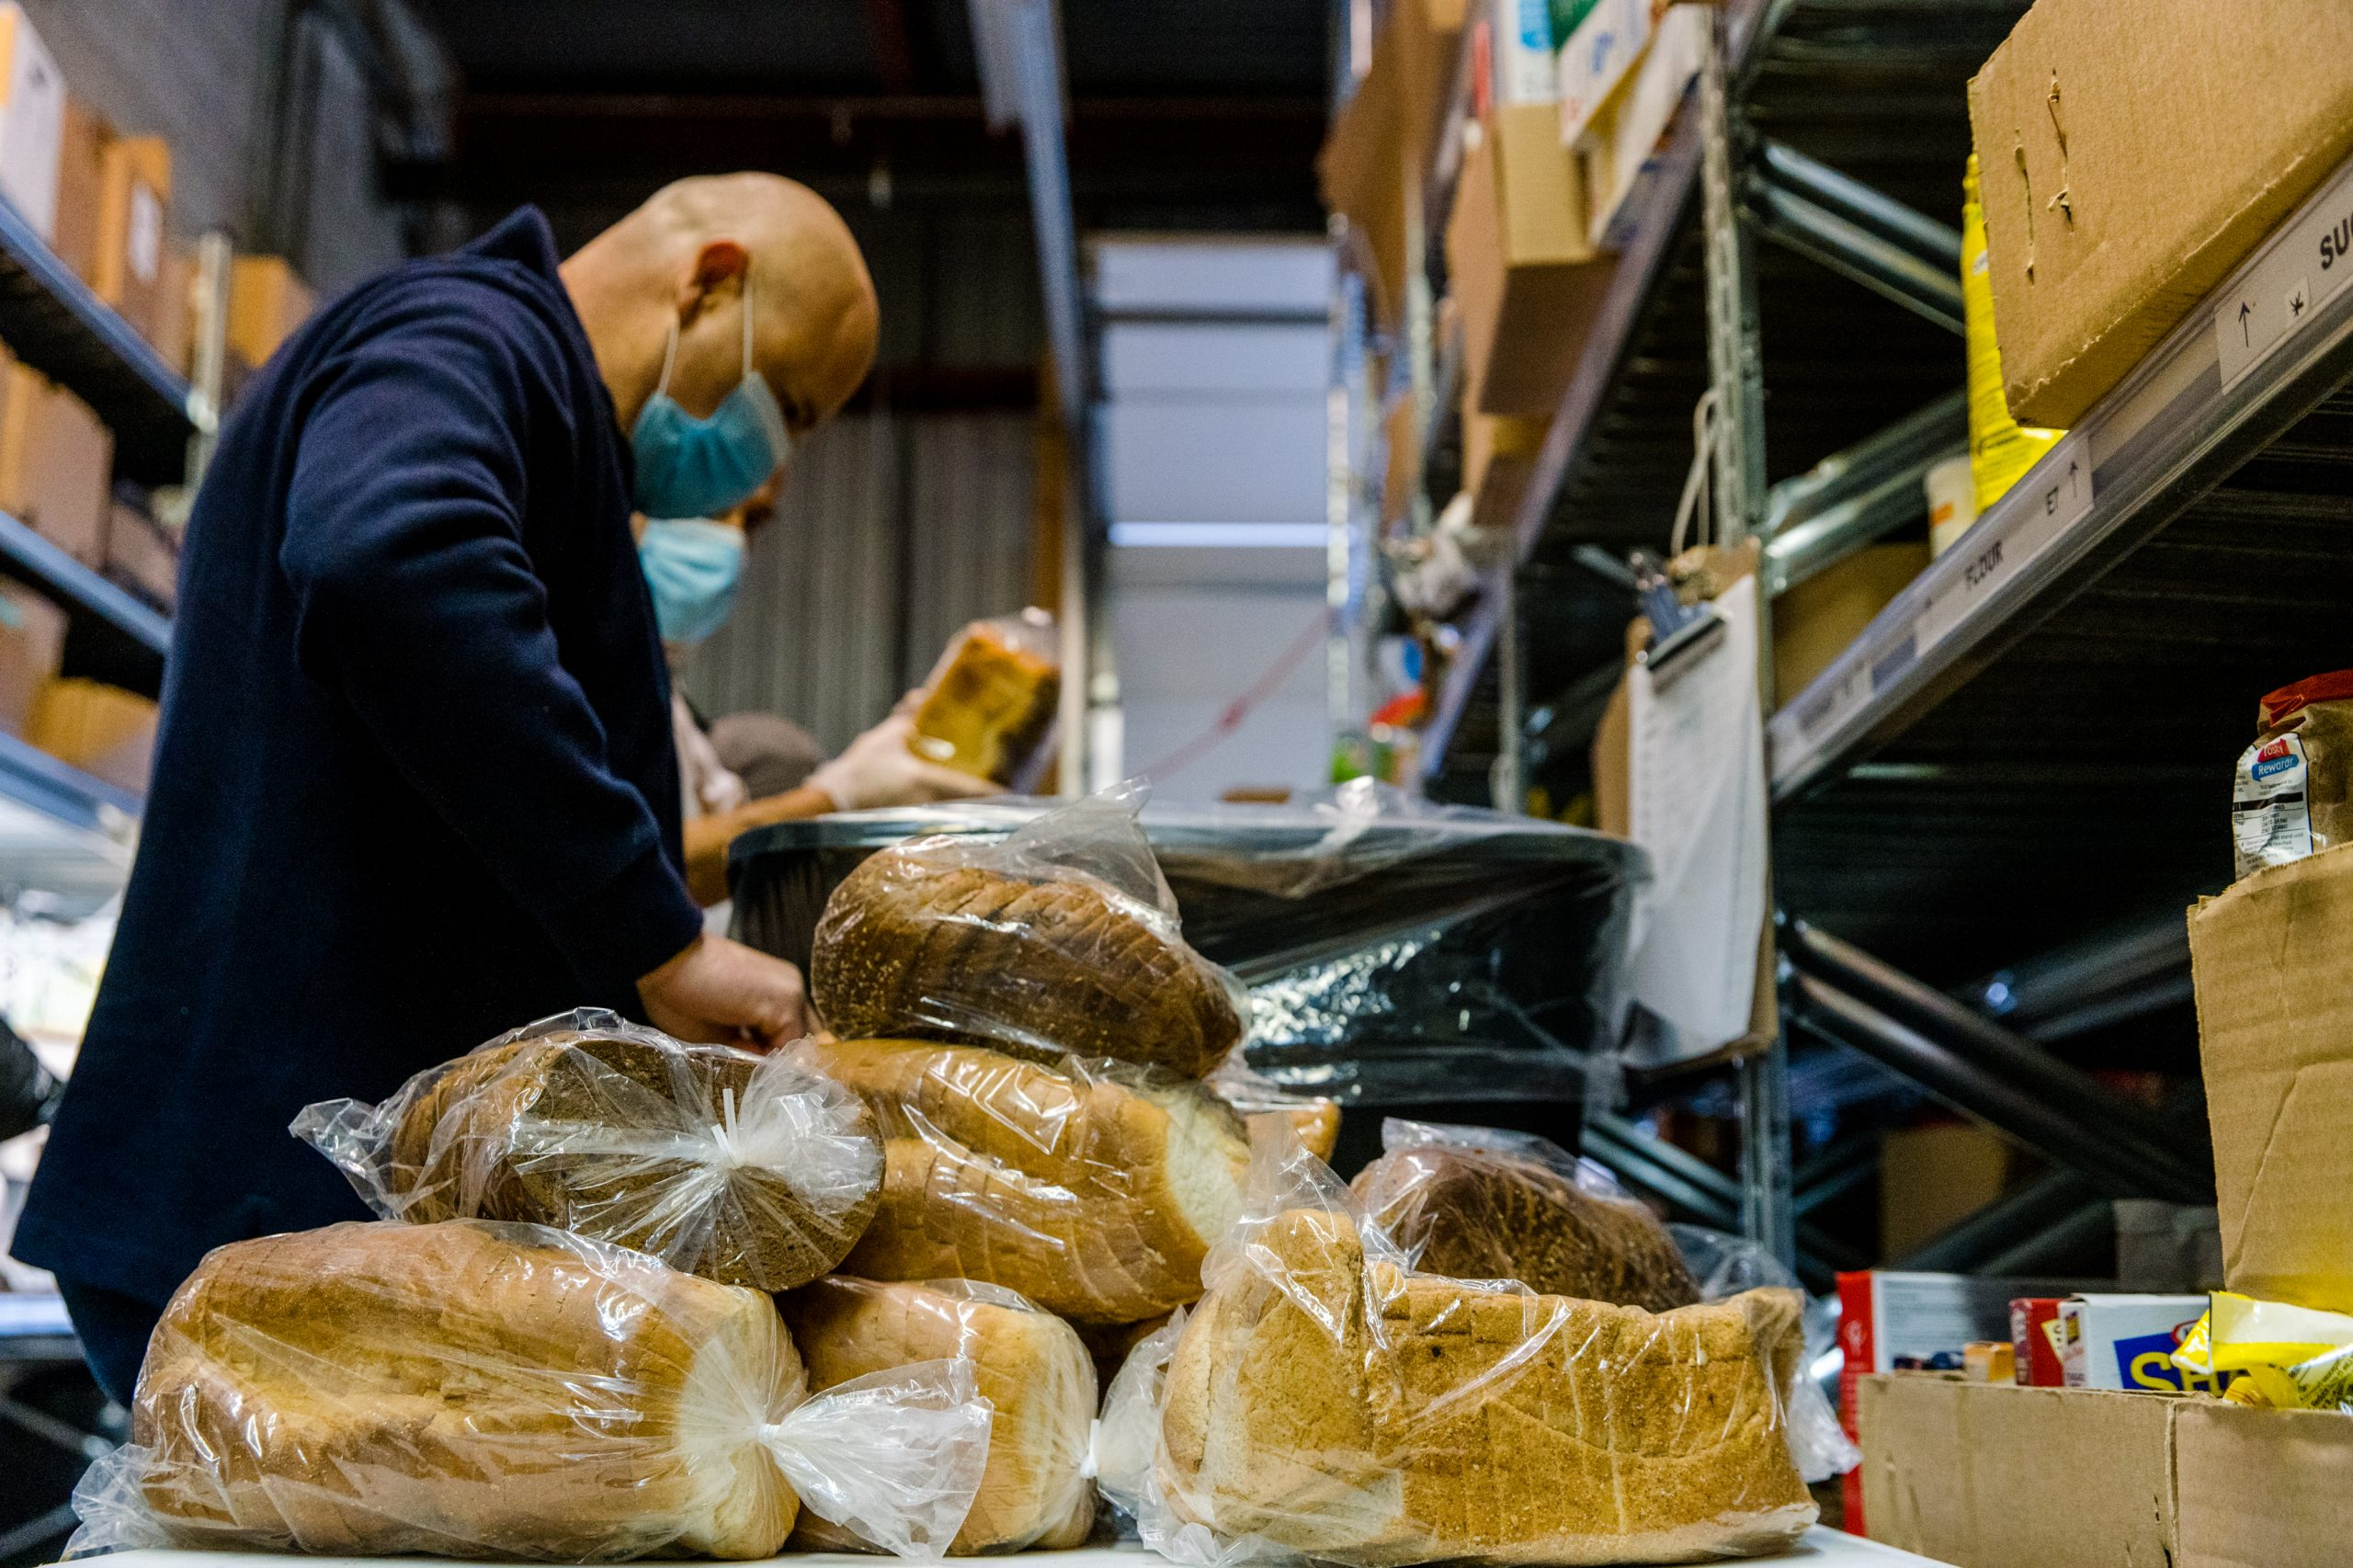 Jewish community 'struggling for kosher meat due to NI Protocol'